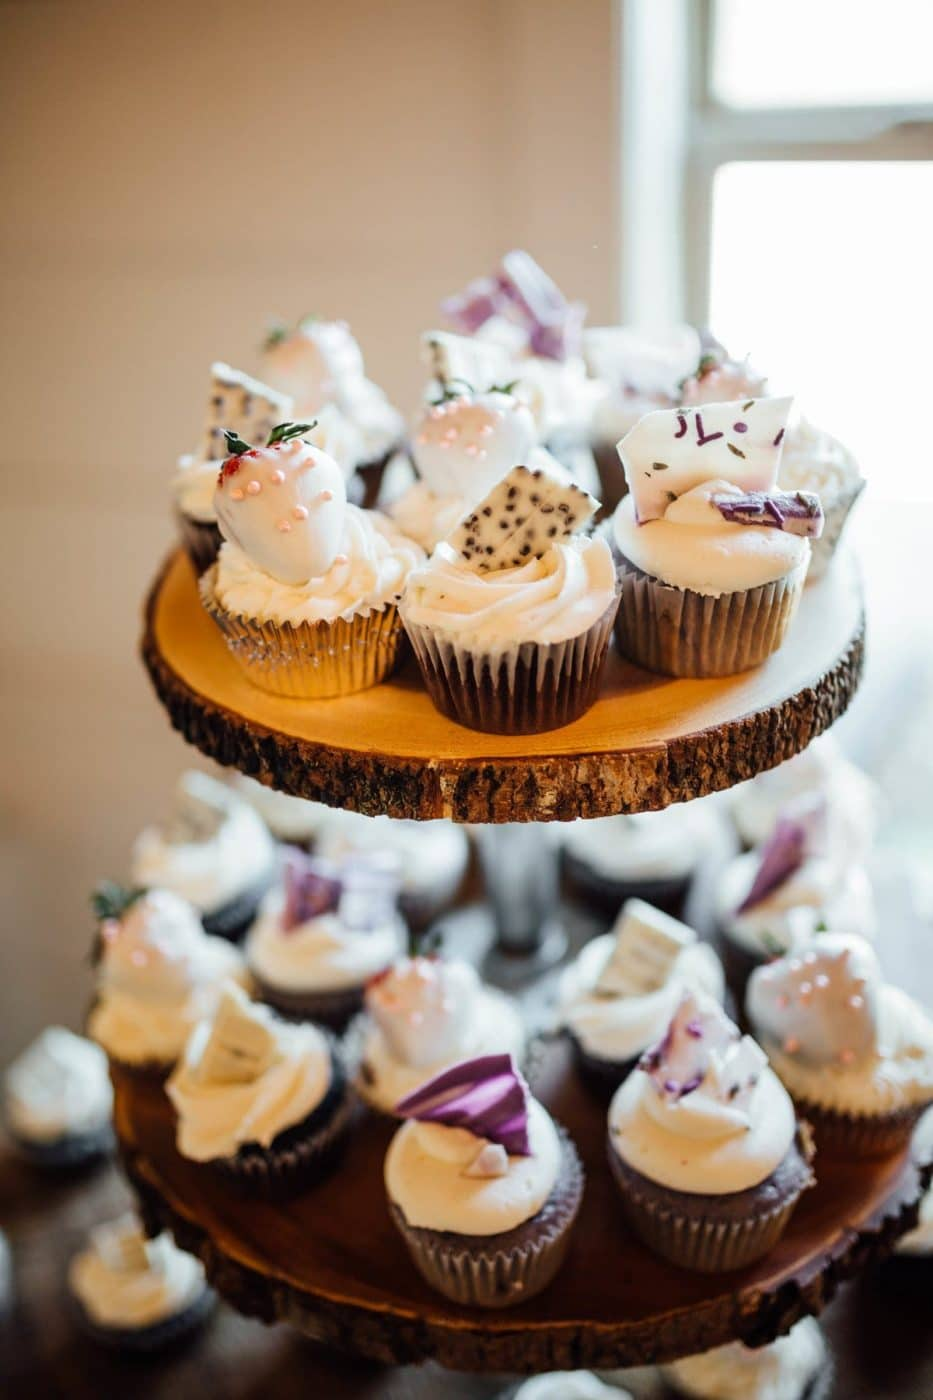 Best North Georgia Wedding Venue, Best North Georgia Wedding Venue & Reception Hall: Grant Hill Farms